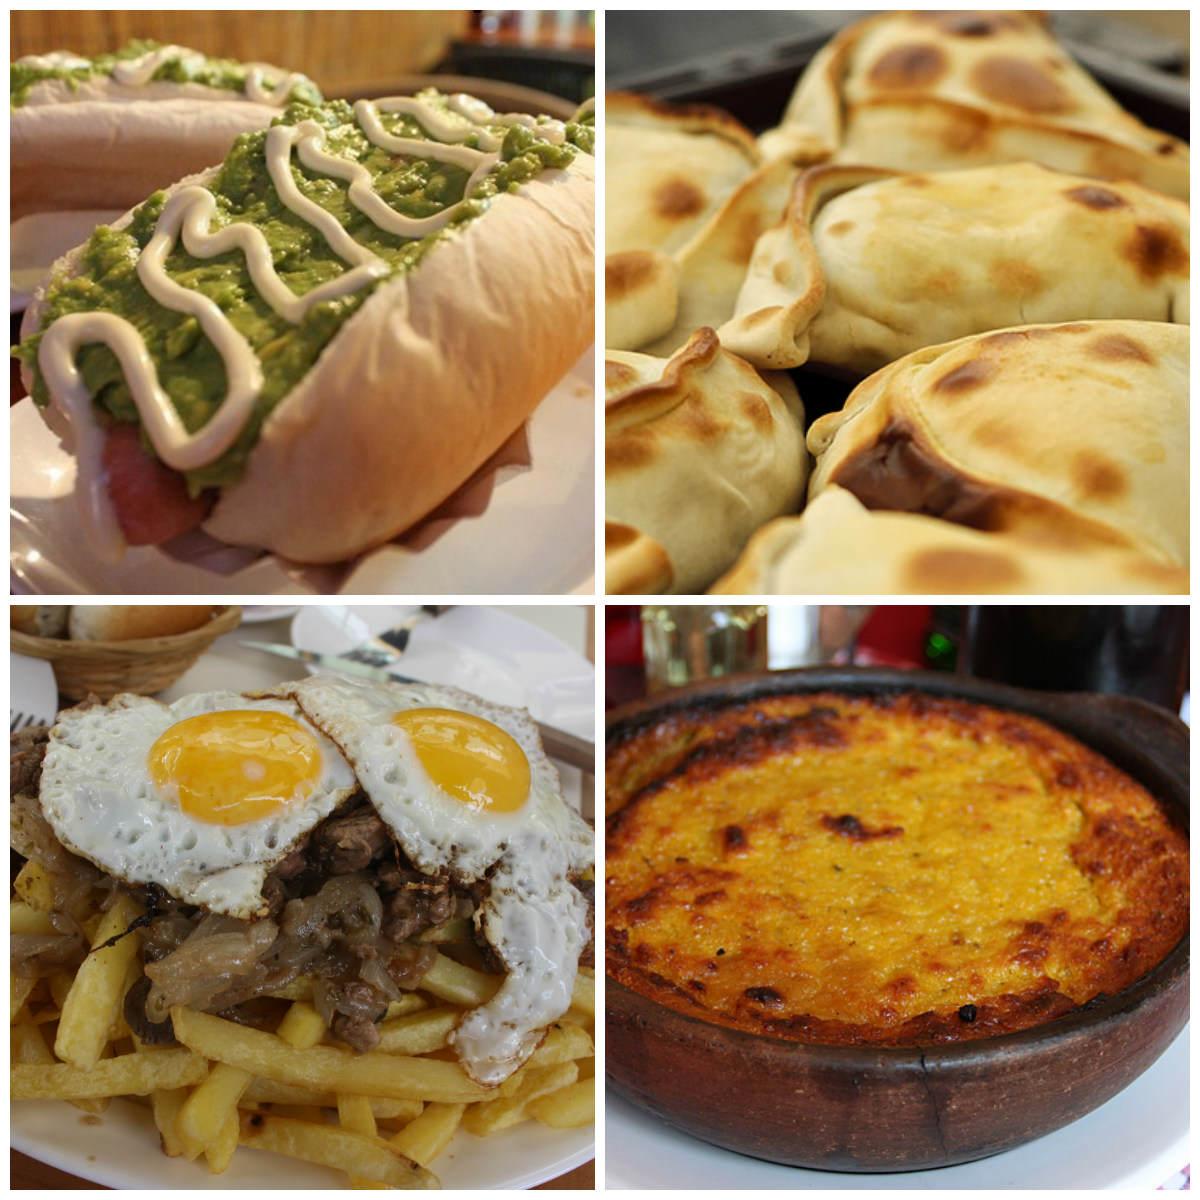 Completo italiano | Empanadas | Chorrillana | Pastel de choclo